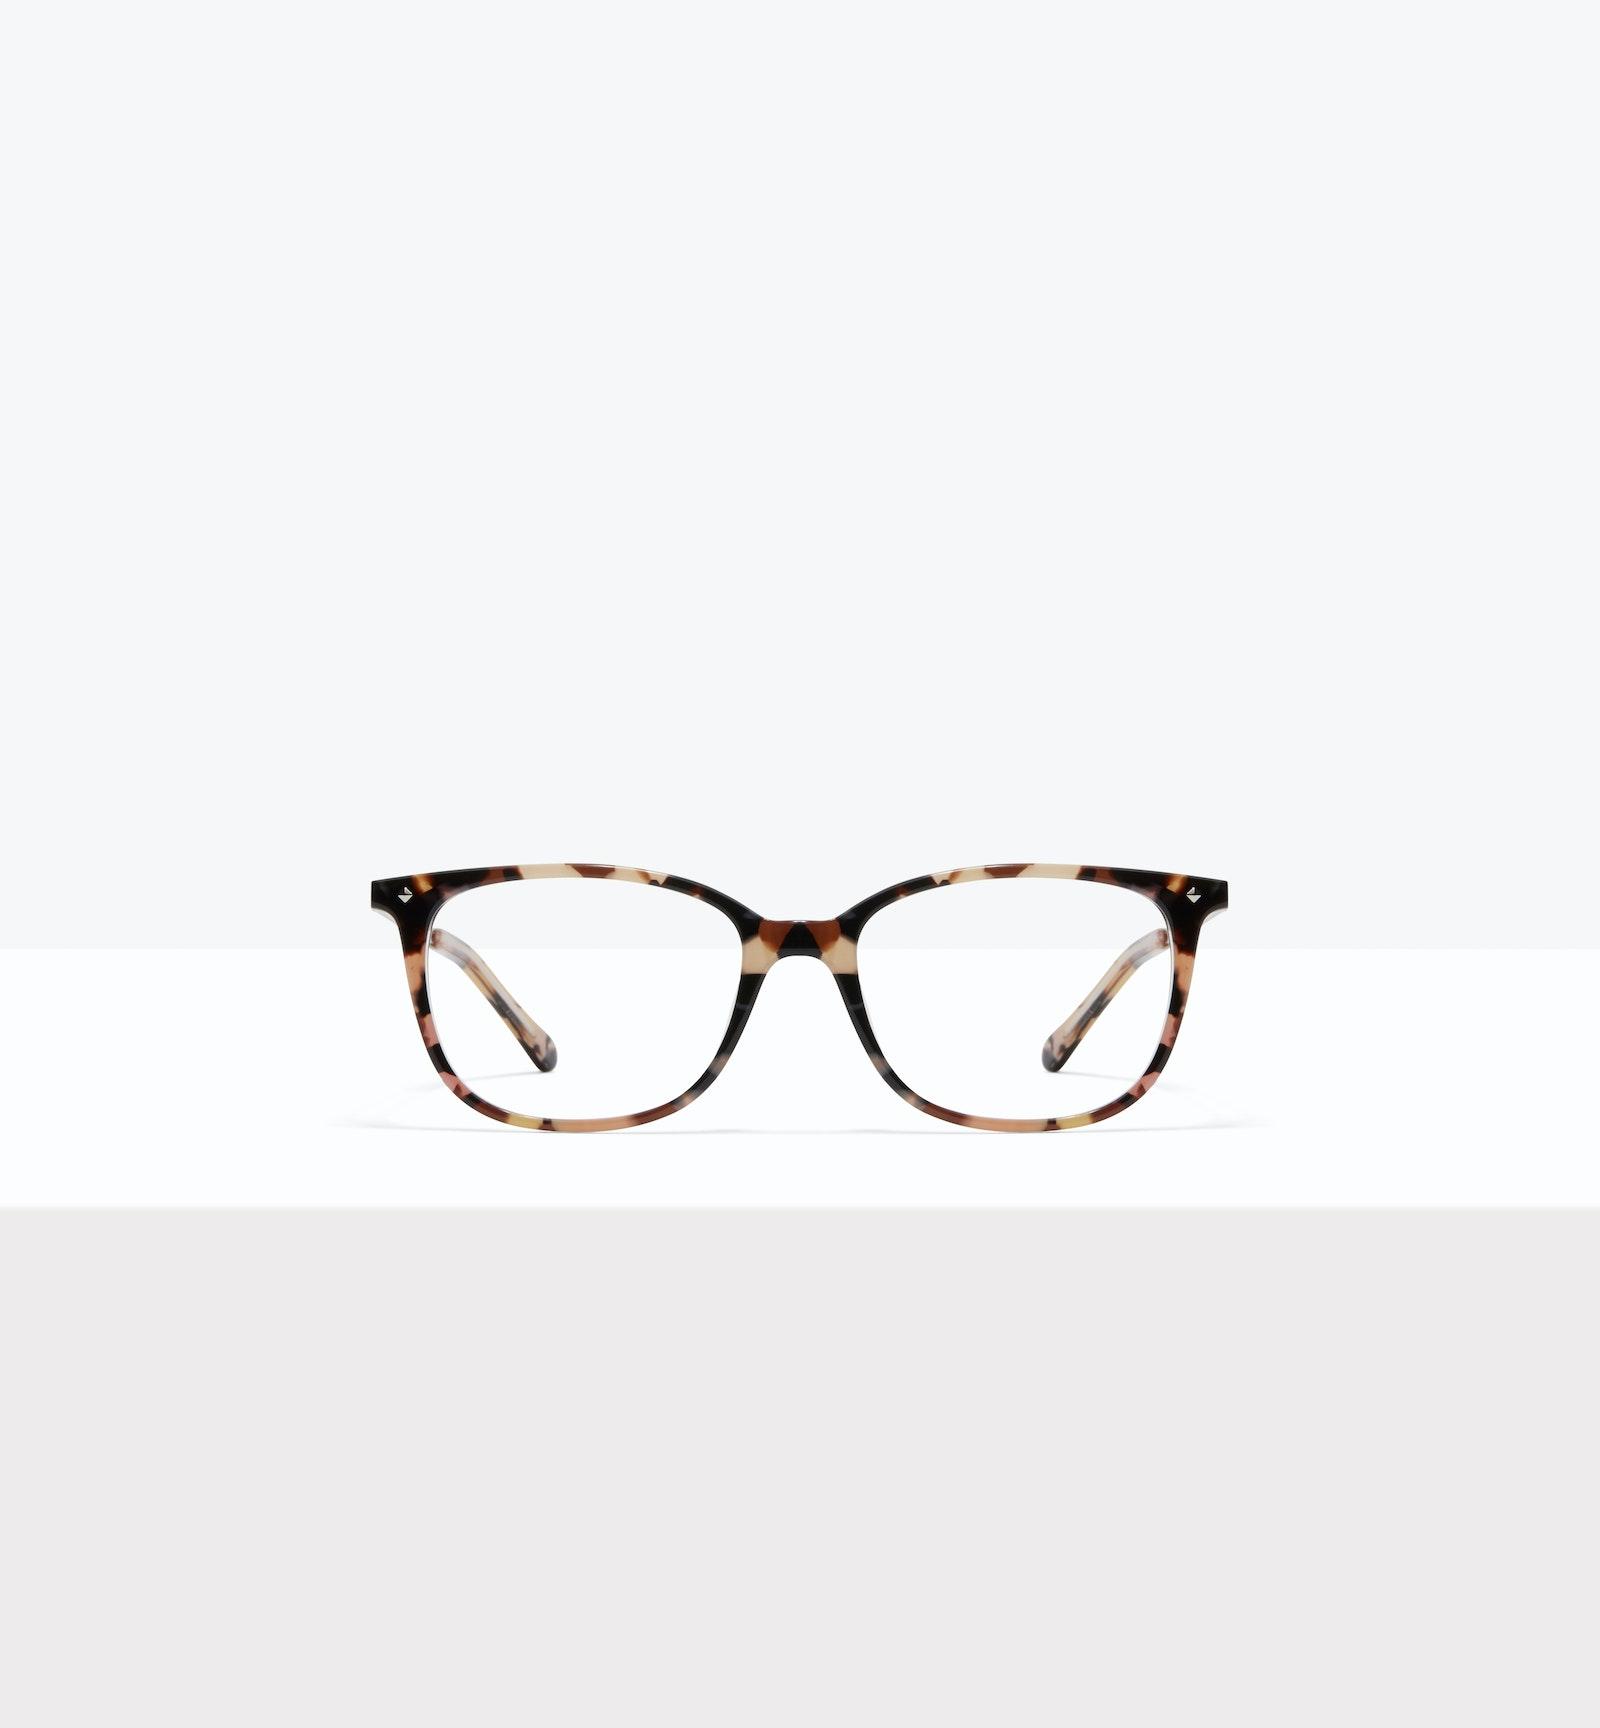 Affordable Fashion Glasses Rectangle Square Eyeglasses Women Refine S Pastel Tort